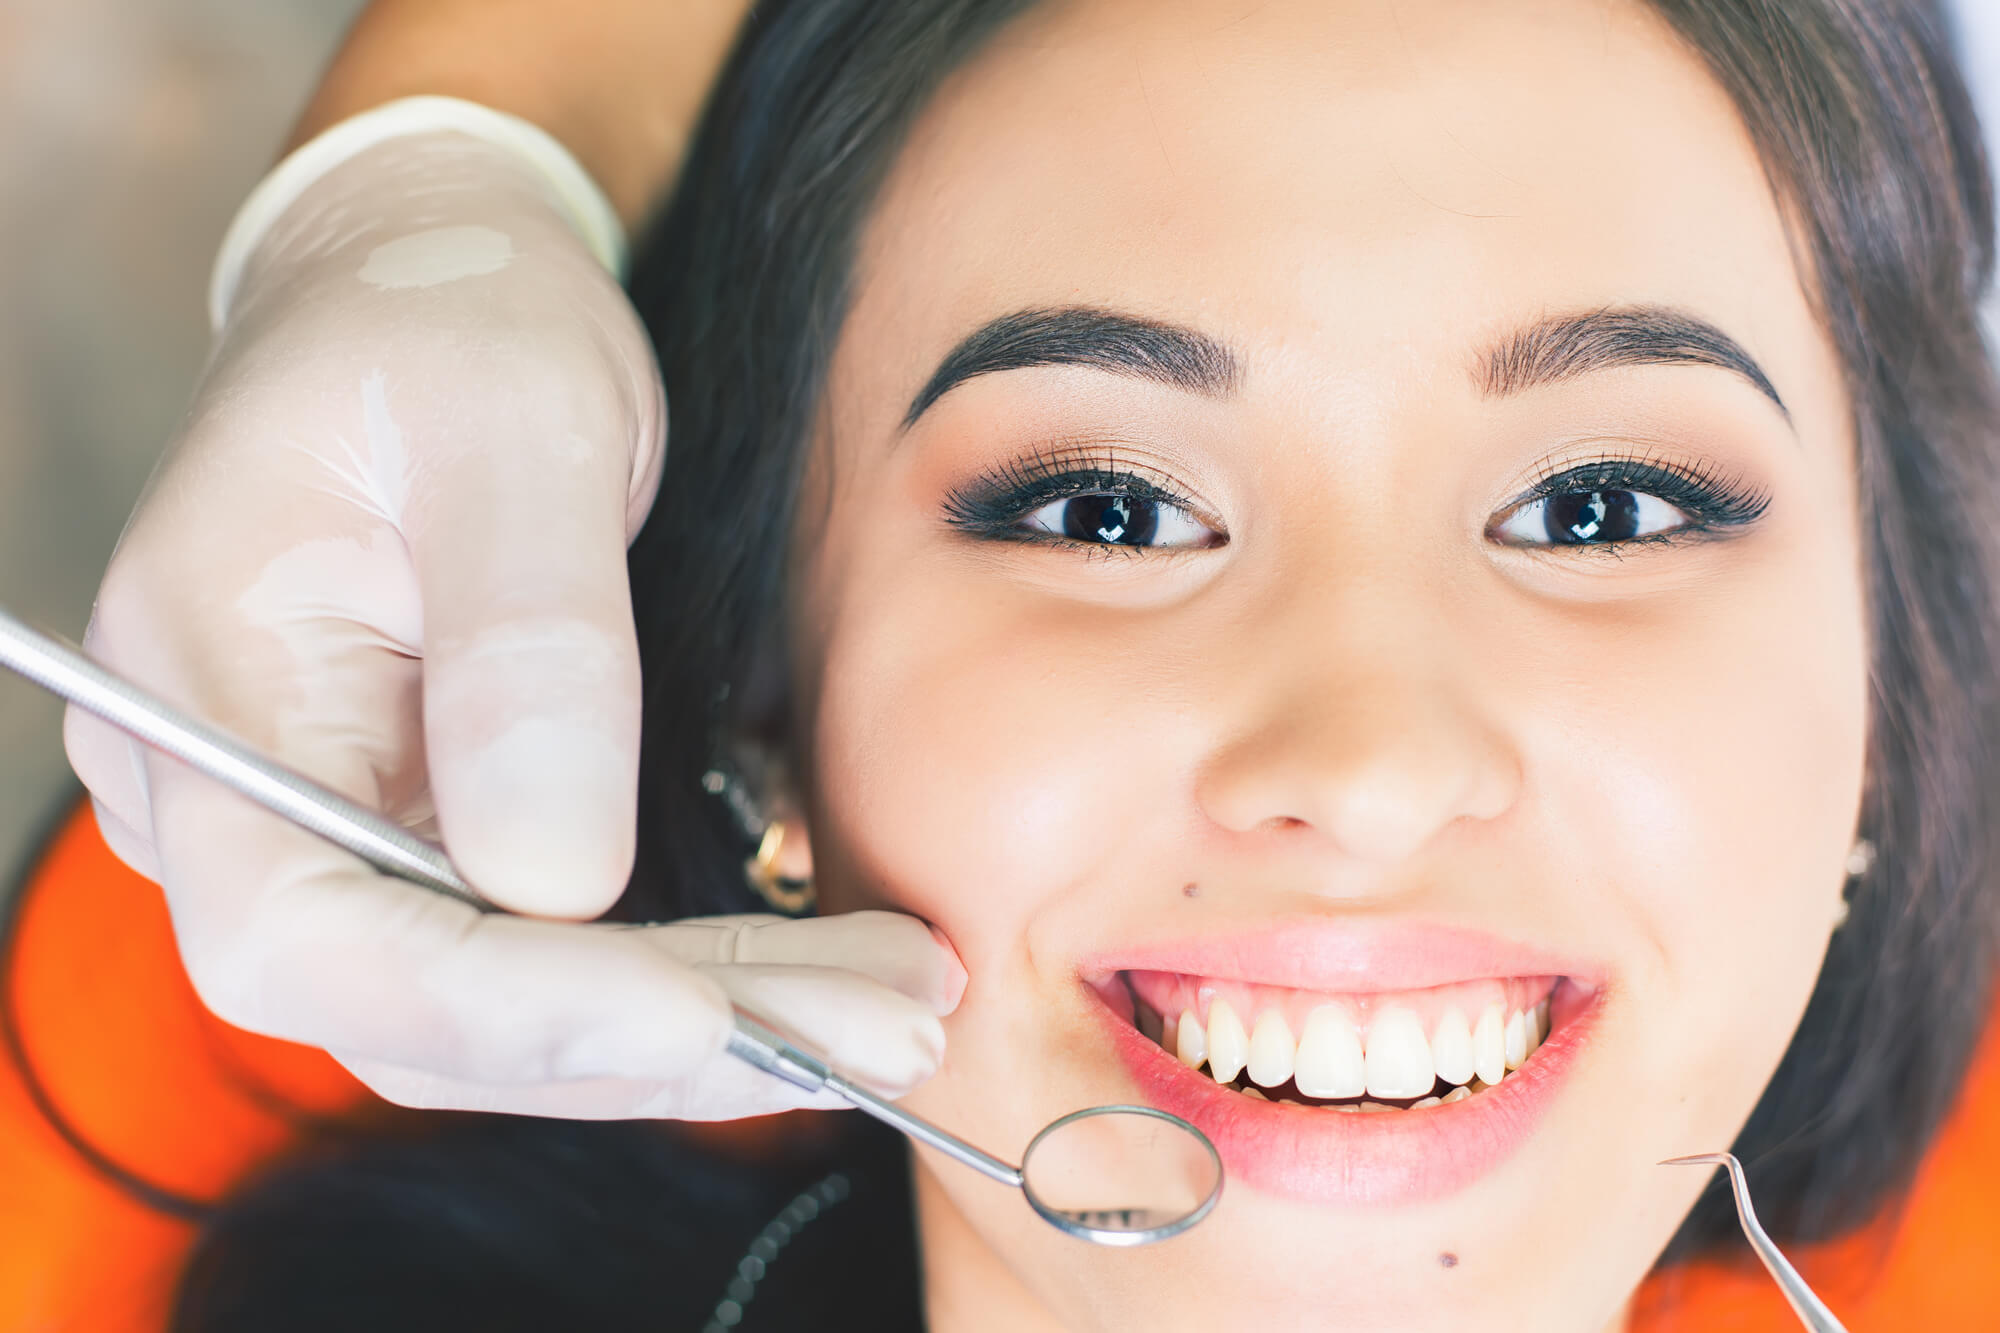 Smiling girl after Dental implants in everett wa.